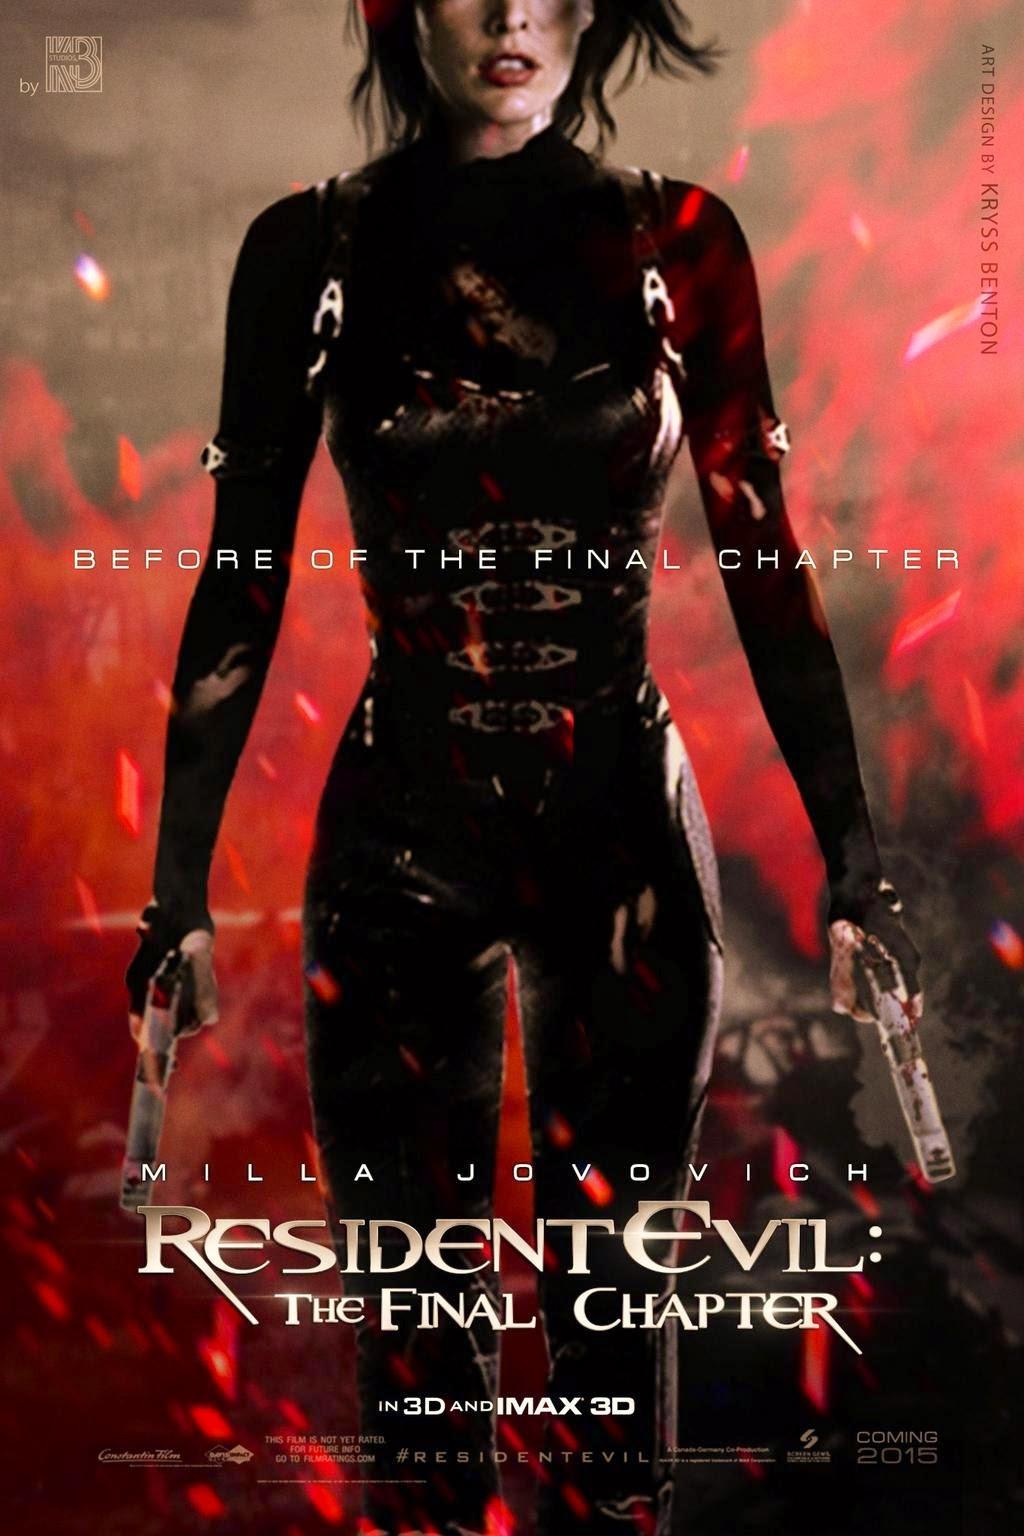 Resident Evil 6: The Final Chapter (2016) ผีชีวะ 6 อวสานผีชีวะ